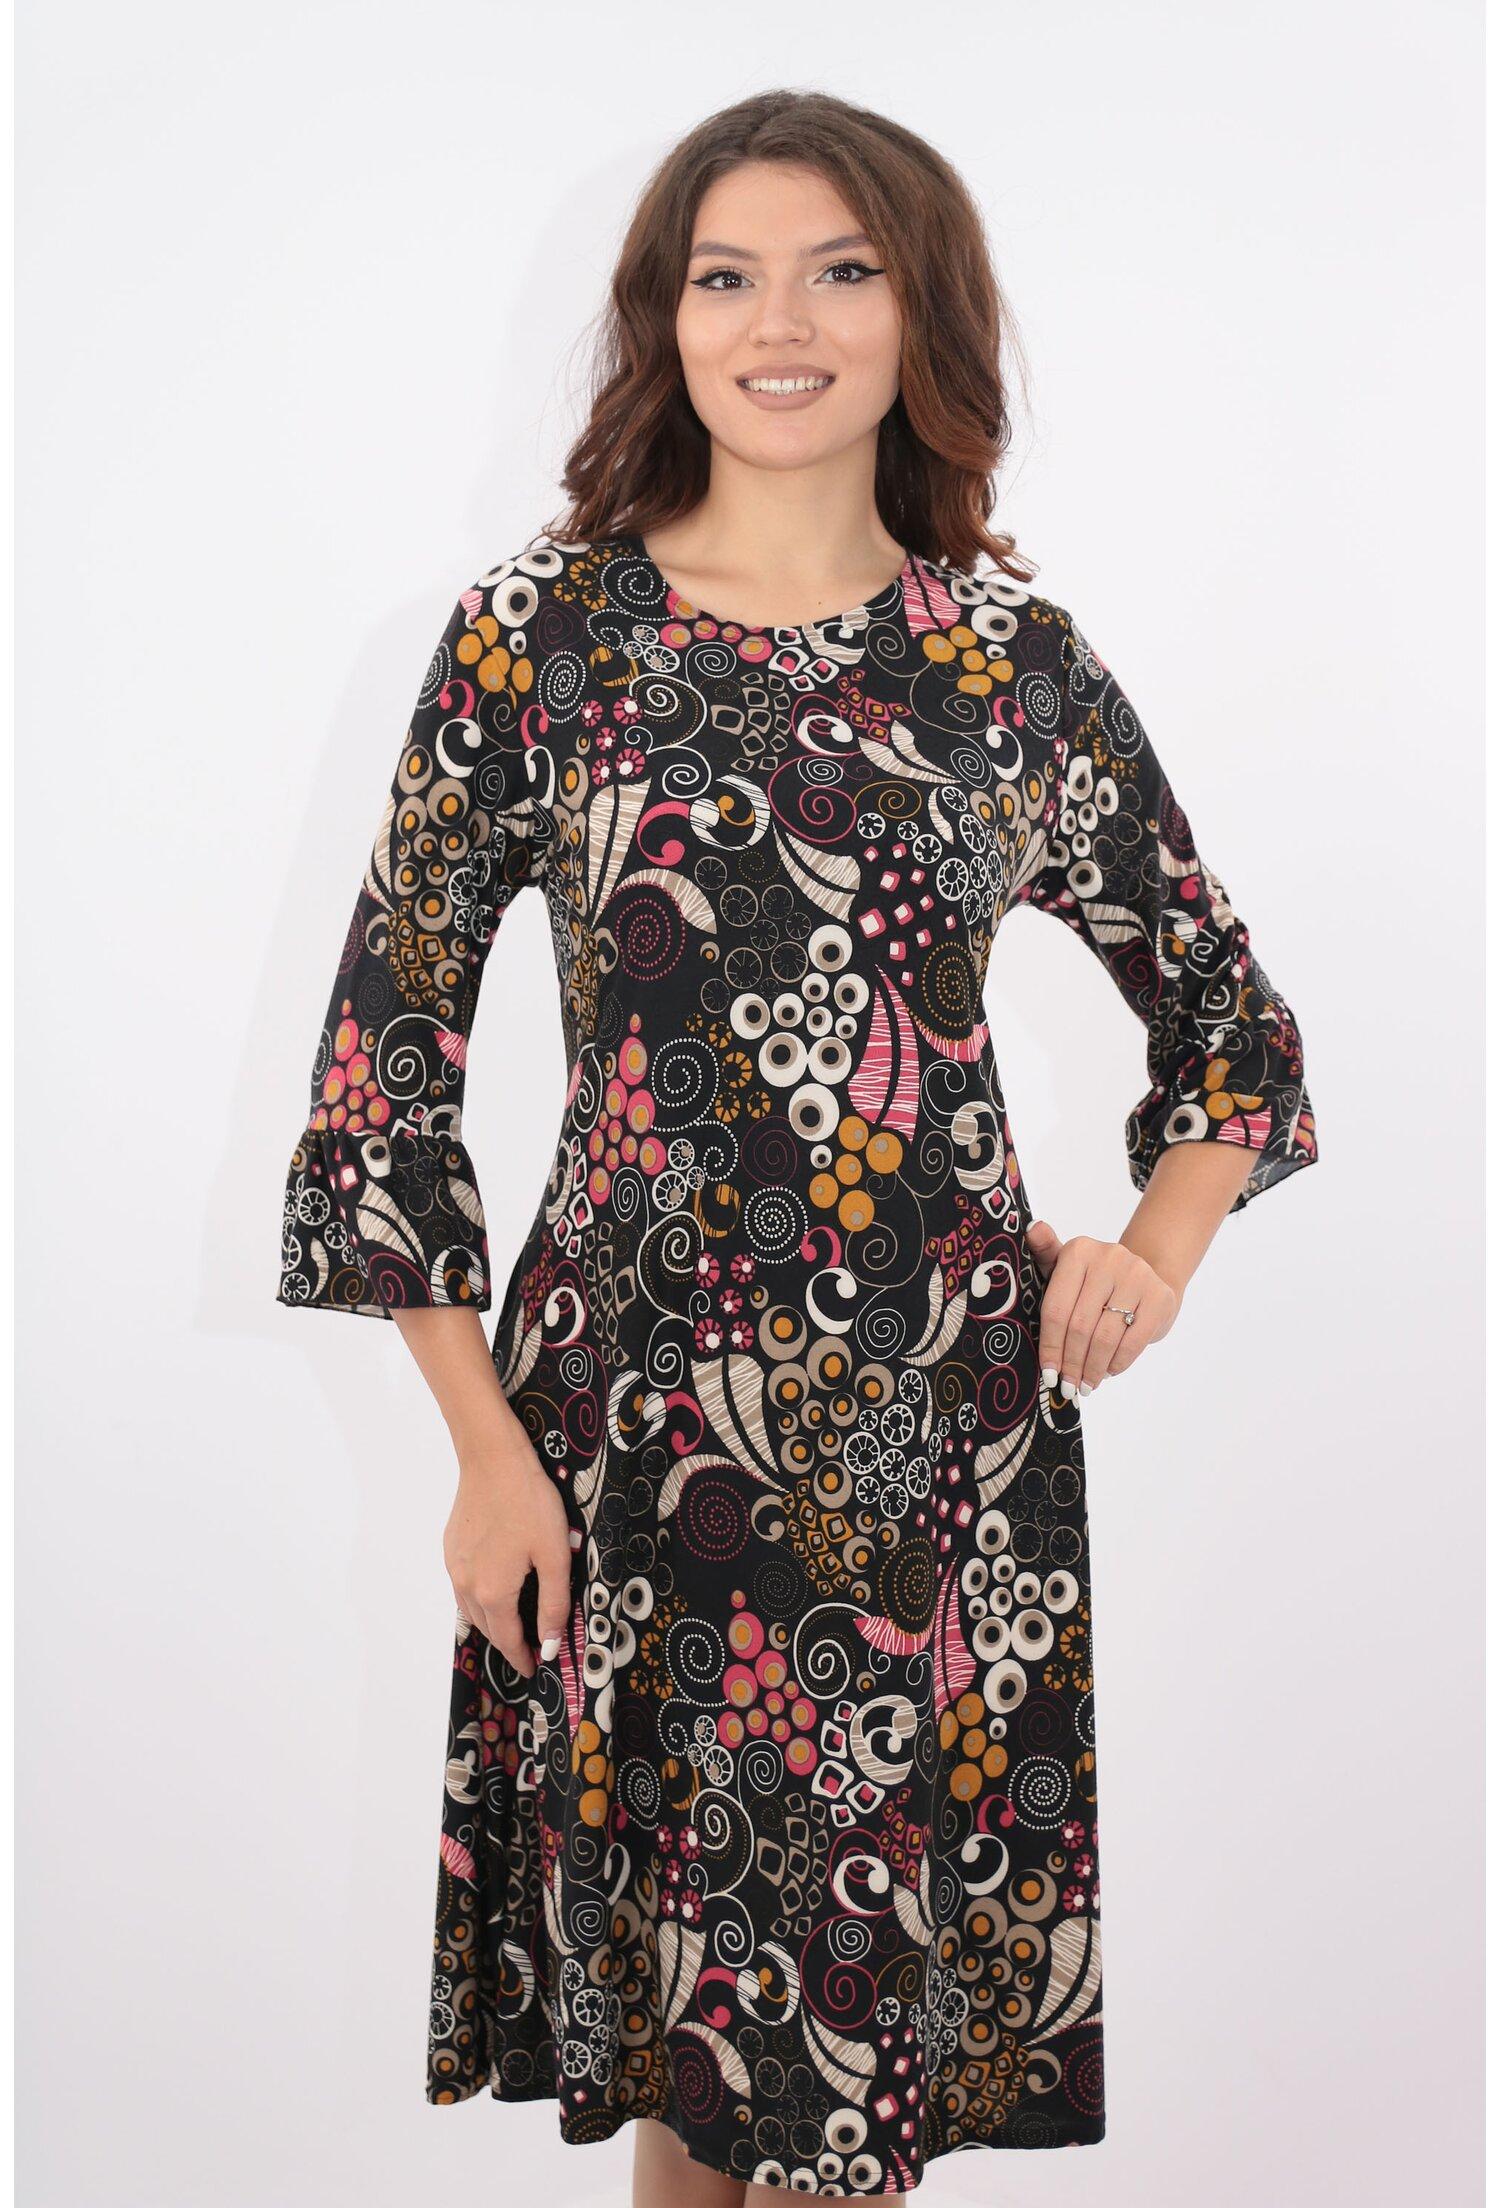 Rochie neagra evazata cu desen multicolor